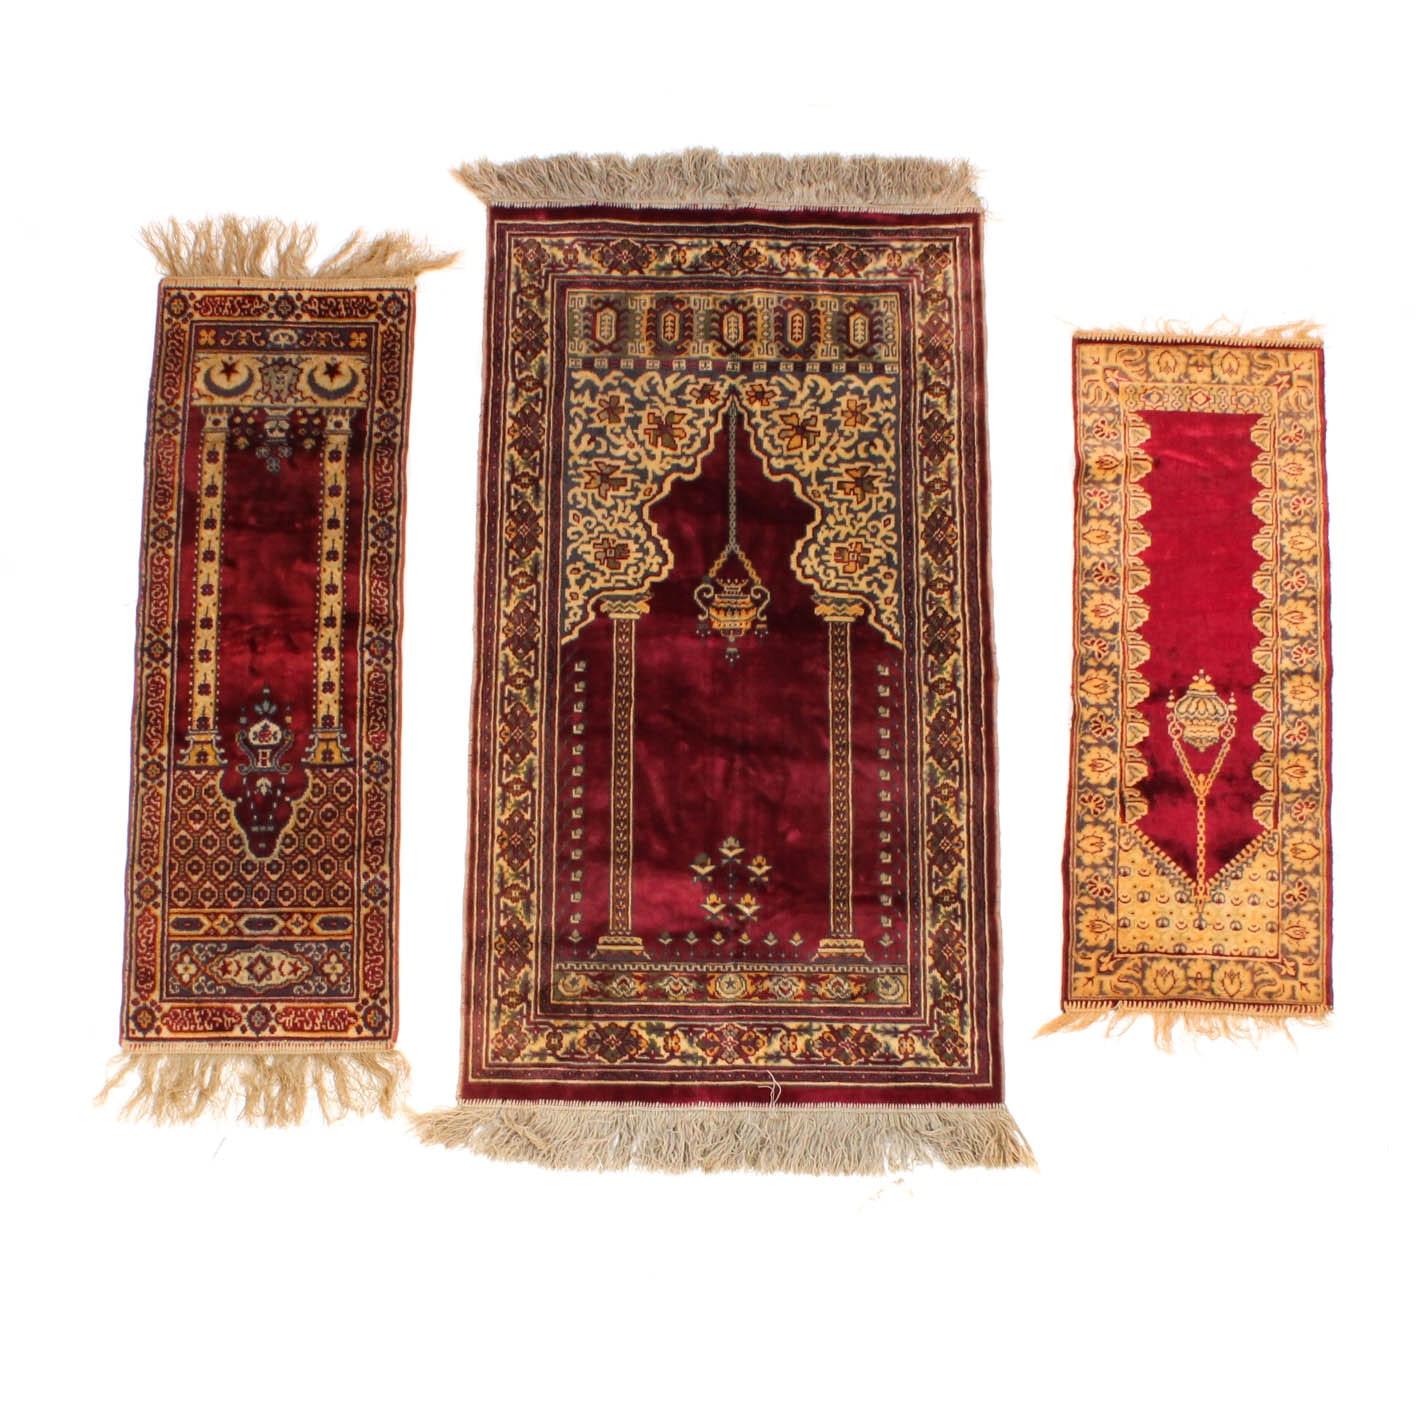 Vintage Machine Woven Plush Prayer Rugs